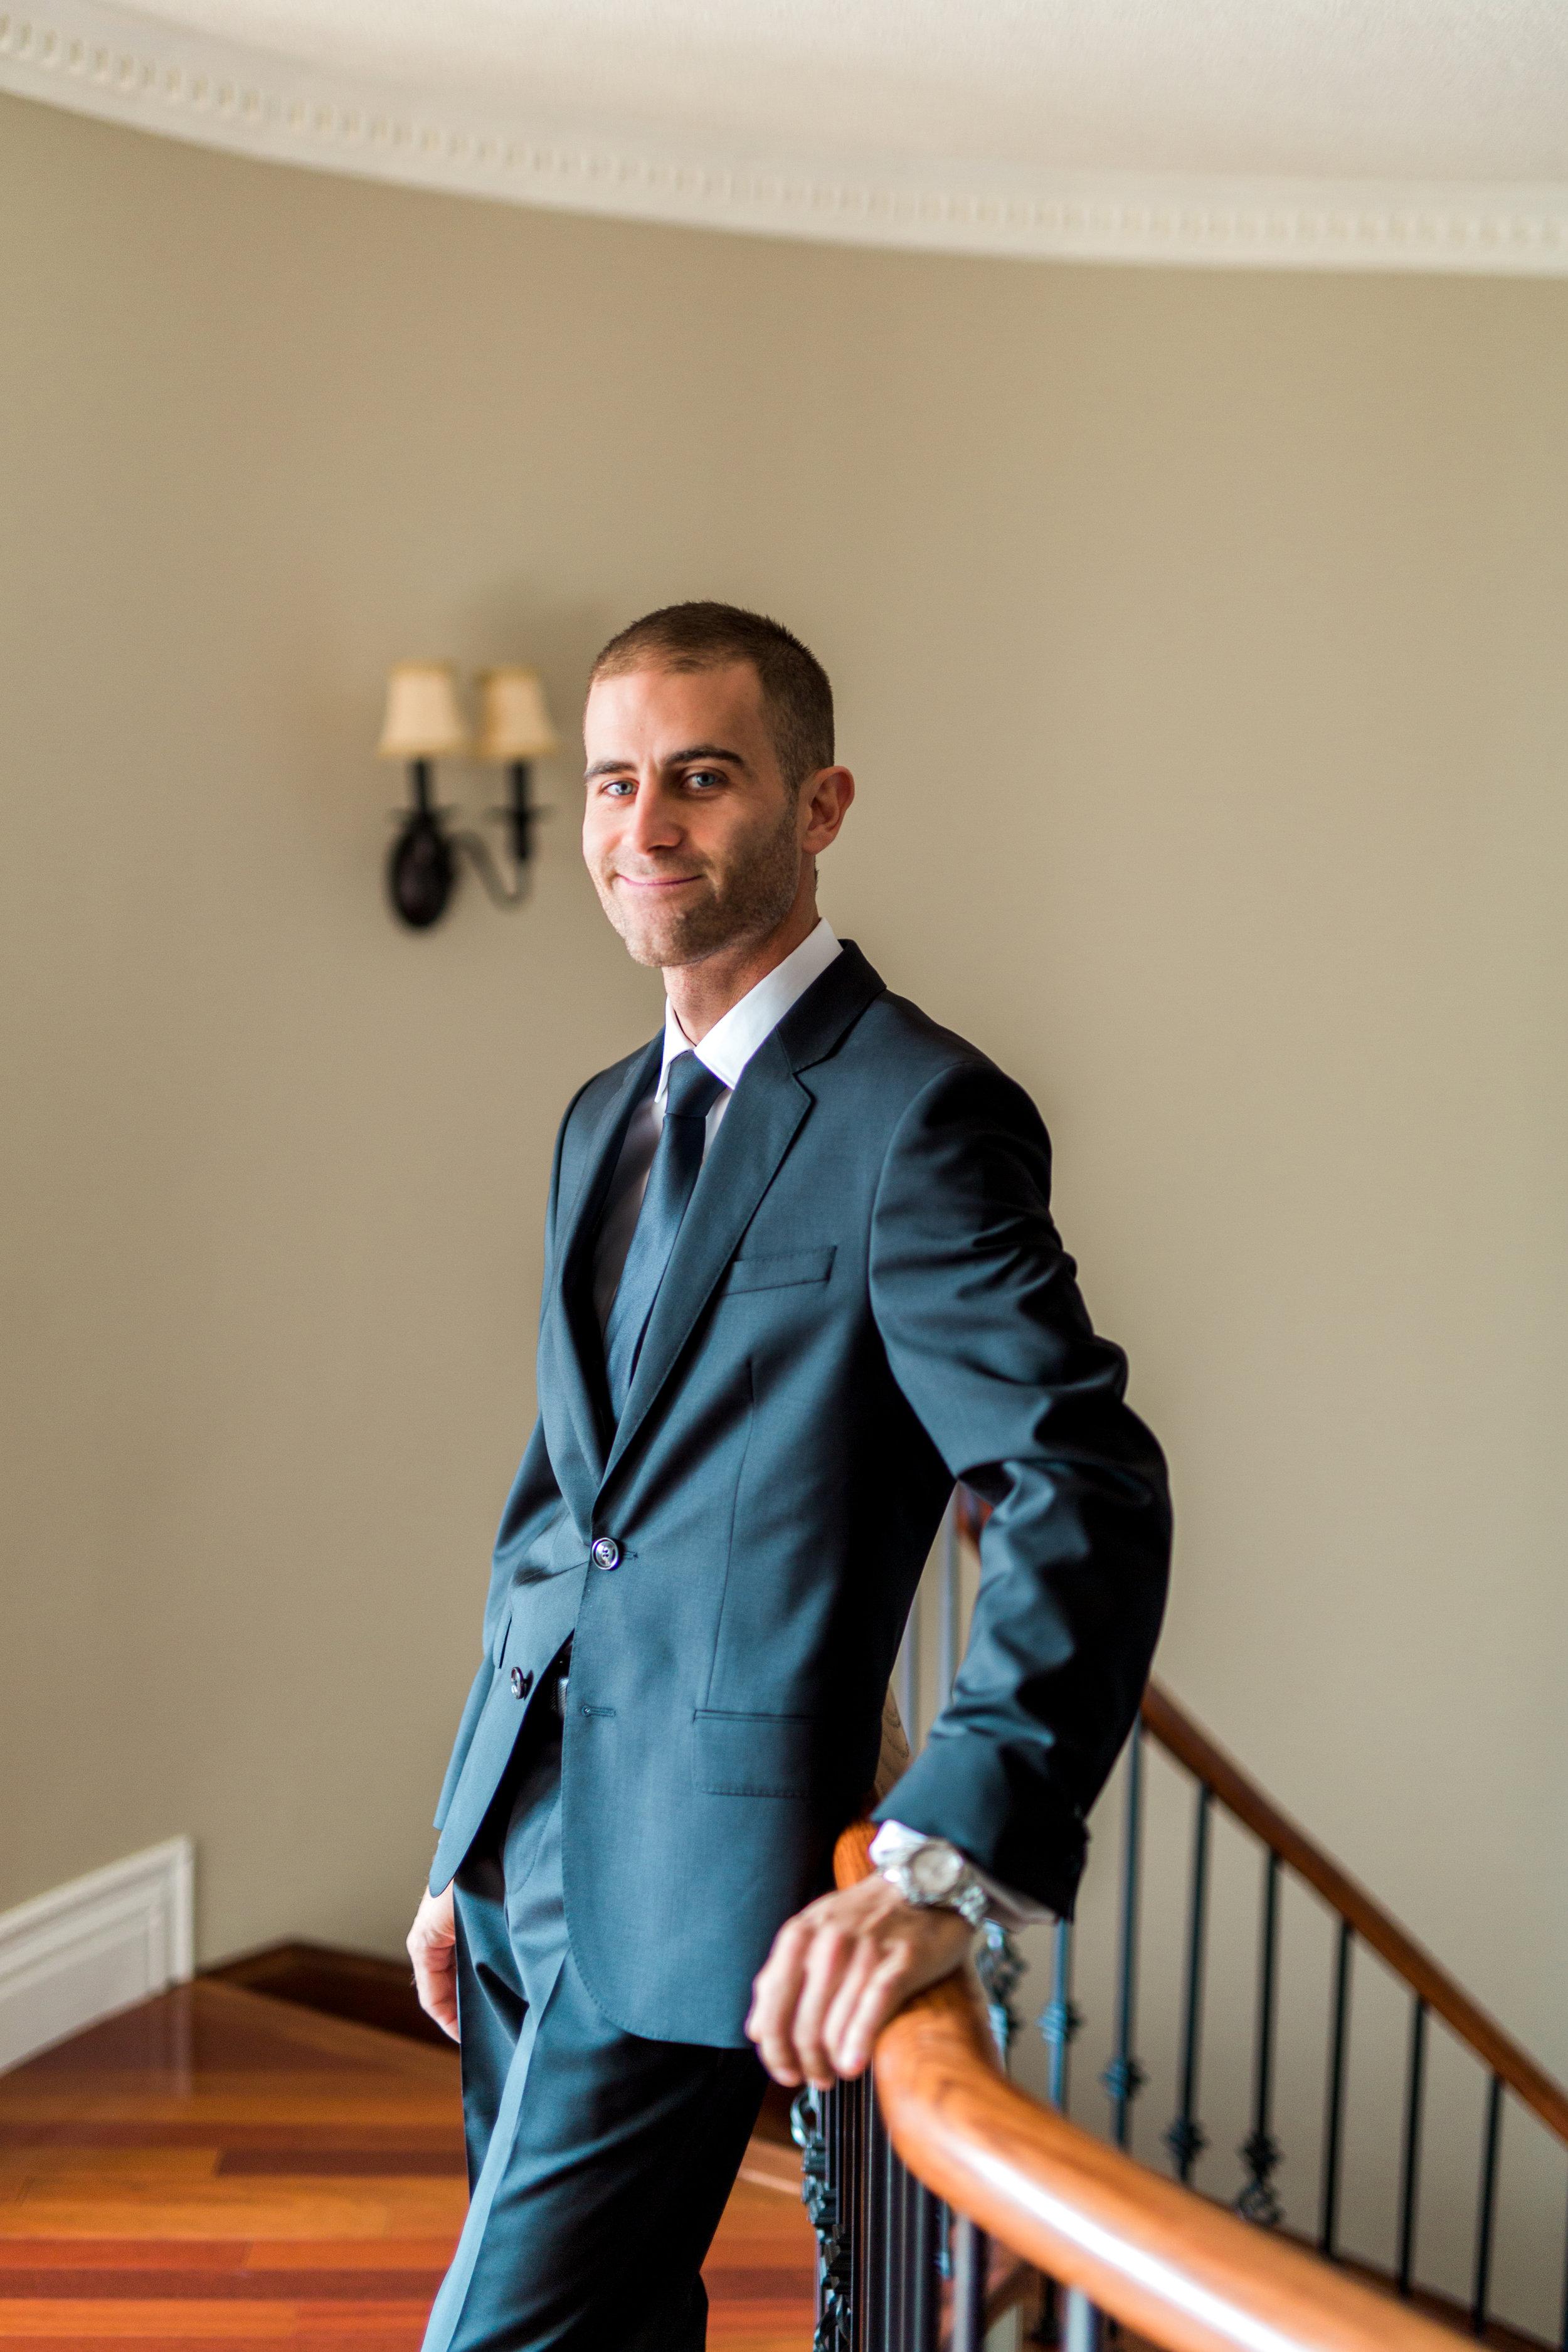 Danielle-Giroux-Amir-Golbazi-Toronto-Wedding-Photographer-Bellvue-Manor_DeLuca_1-029.jpg